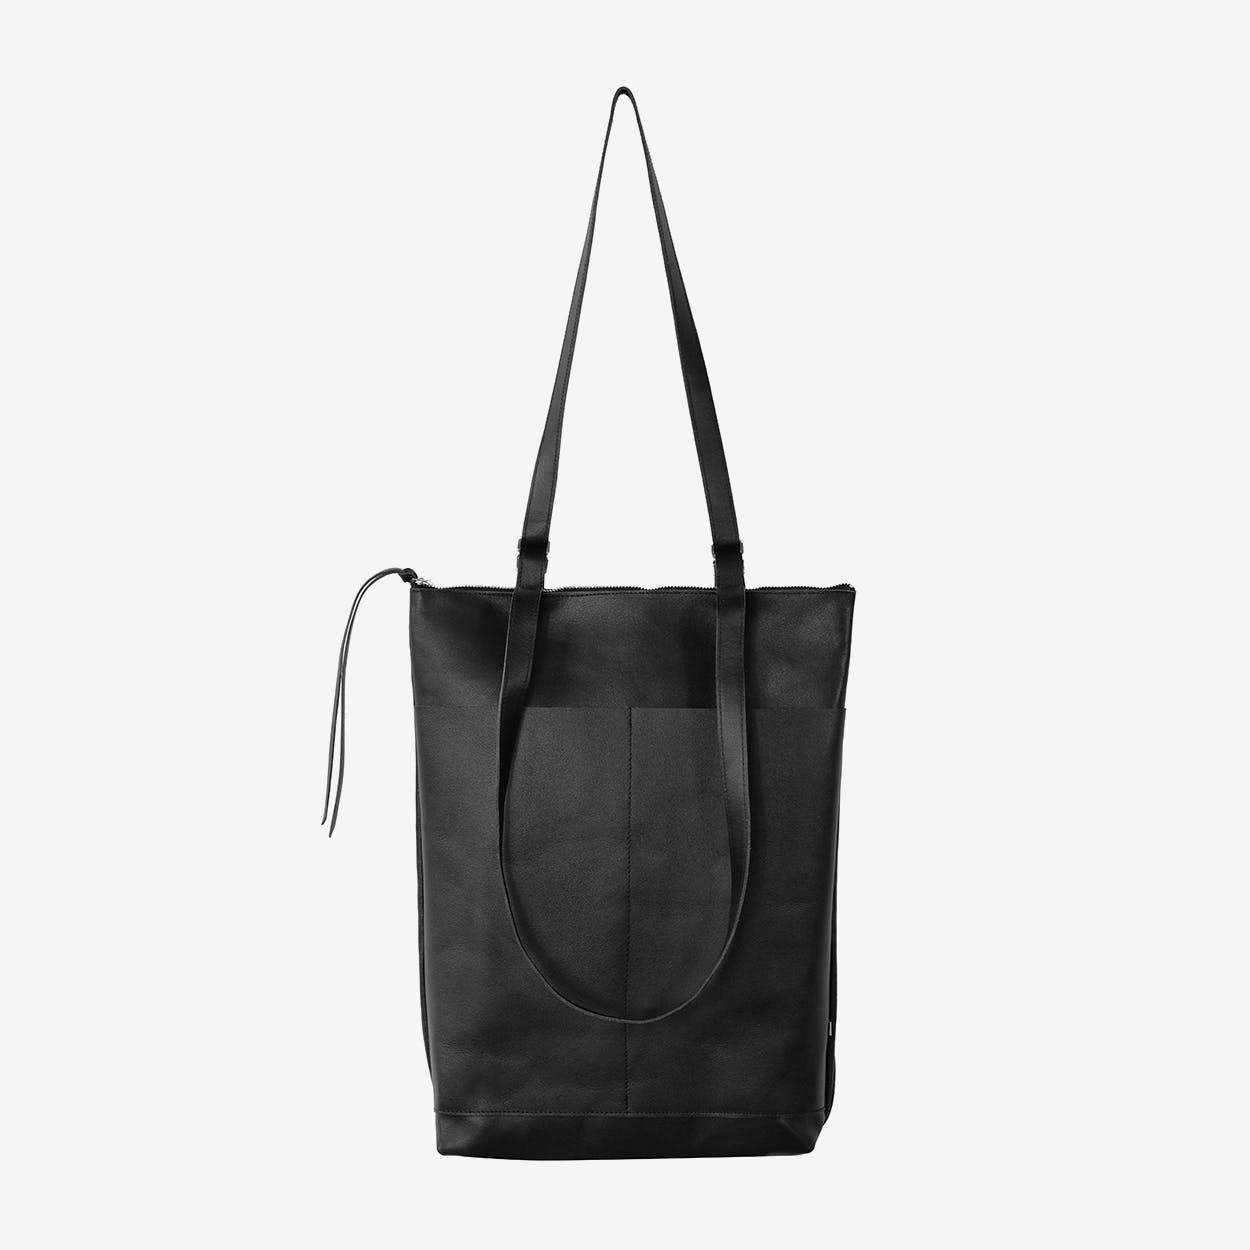 BJARNE Backpack in Black